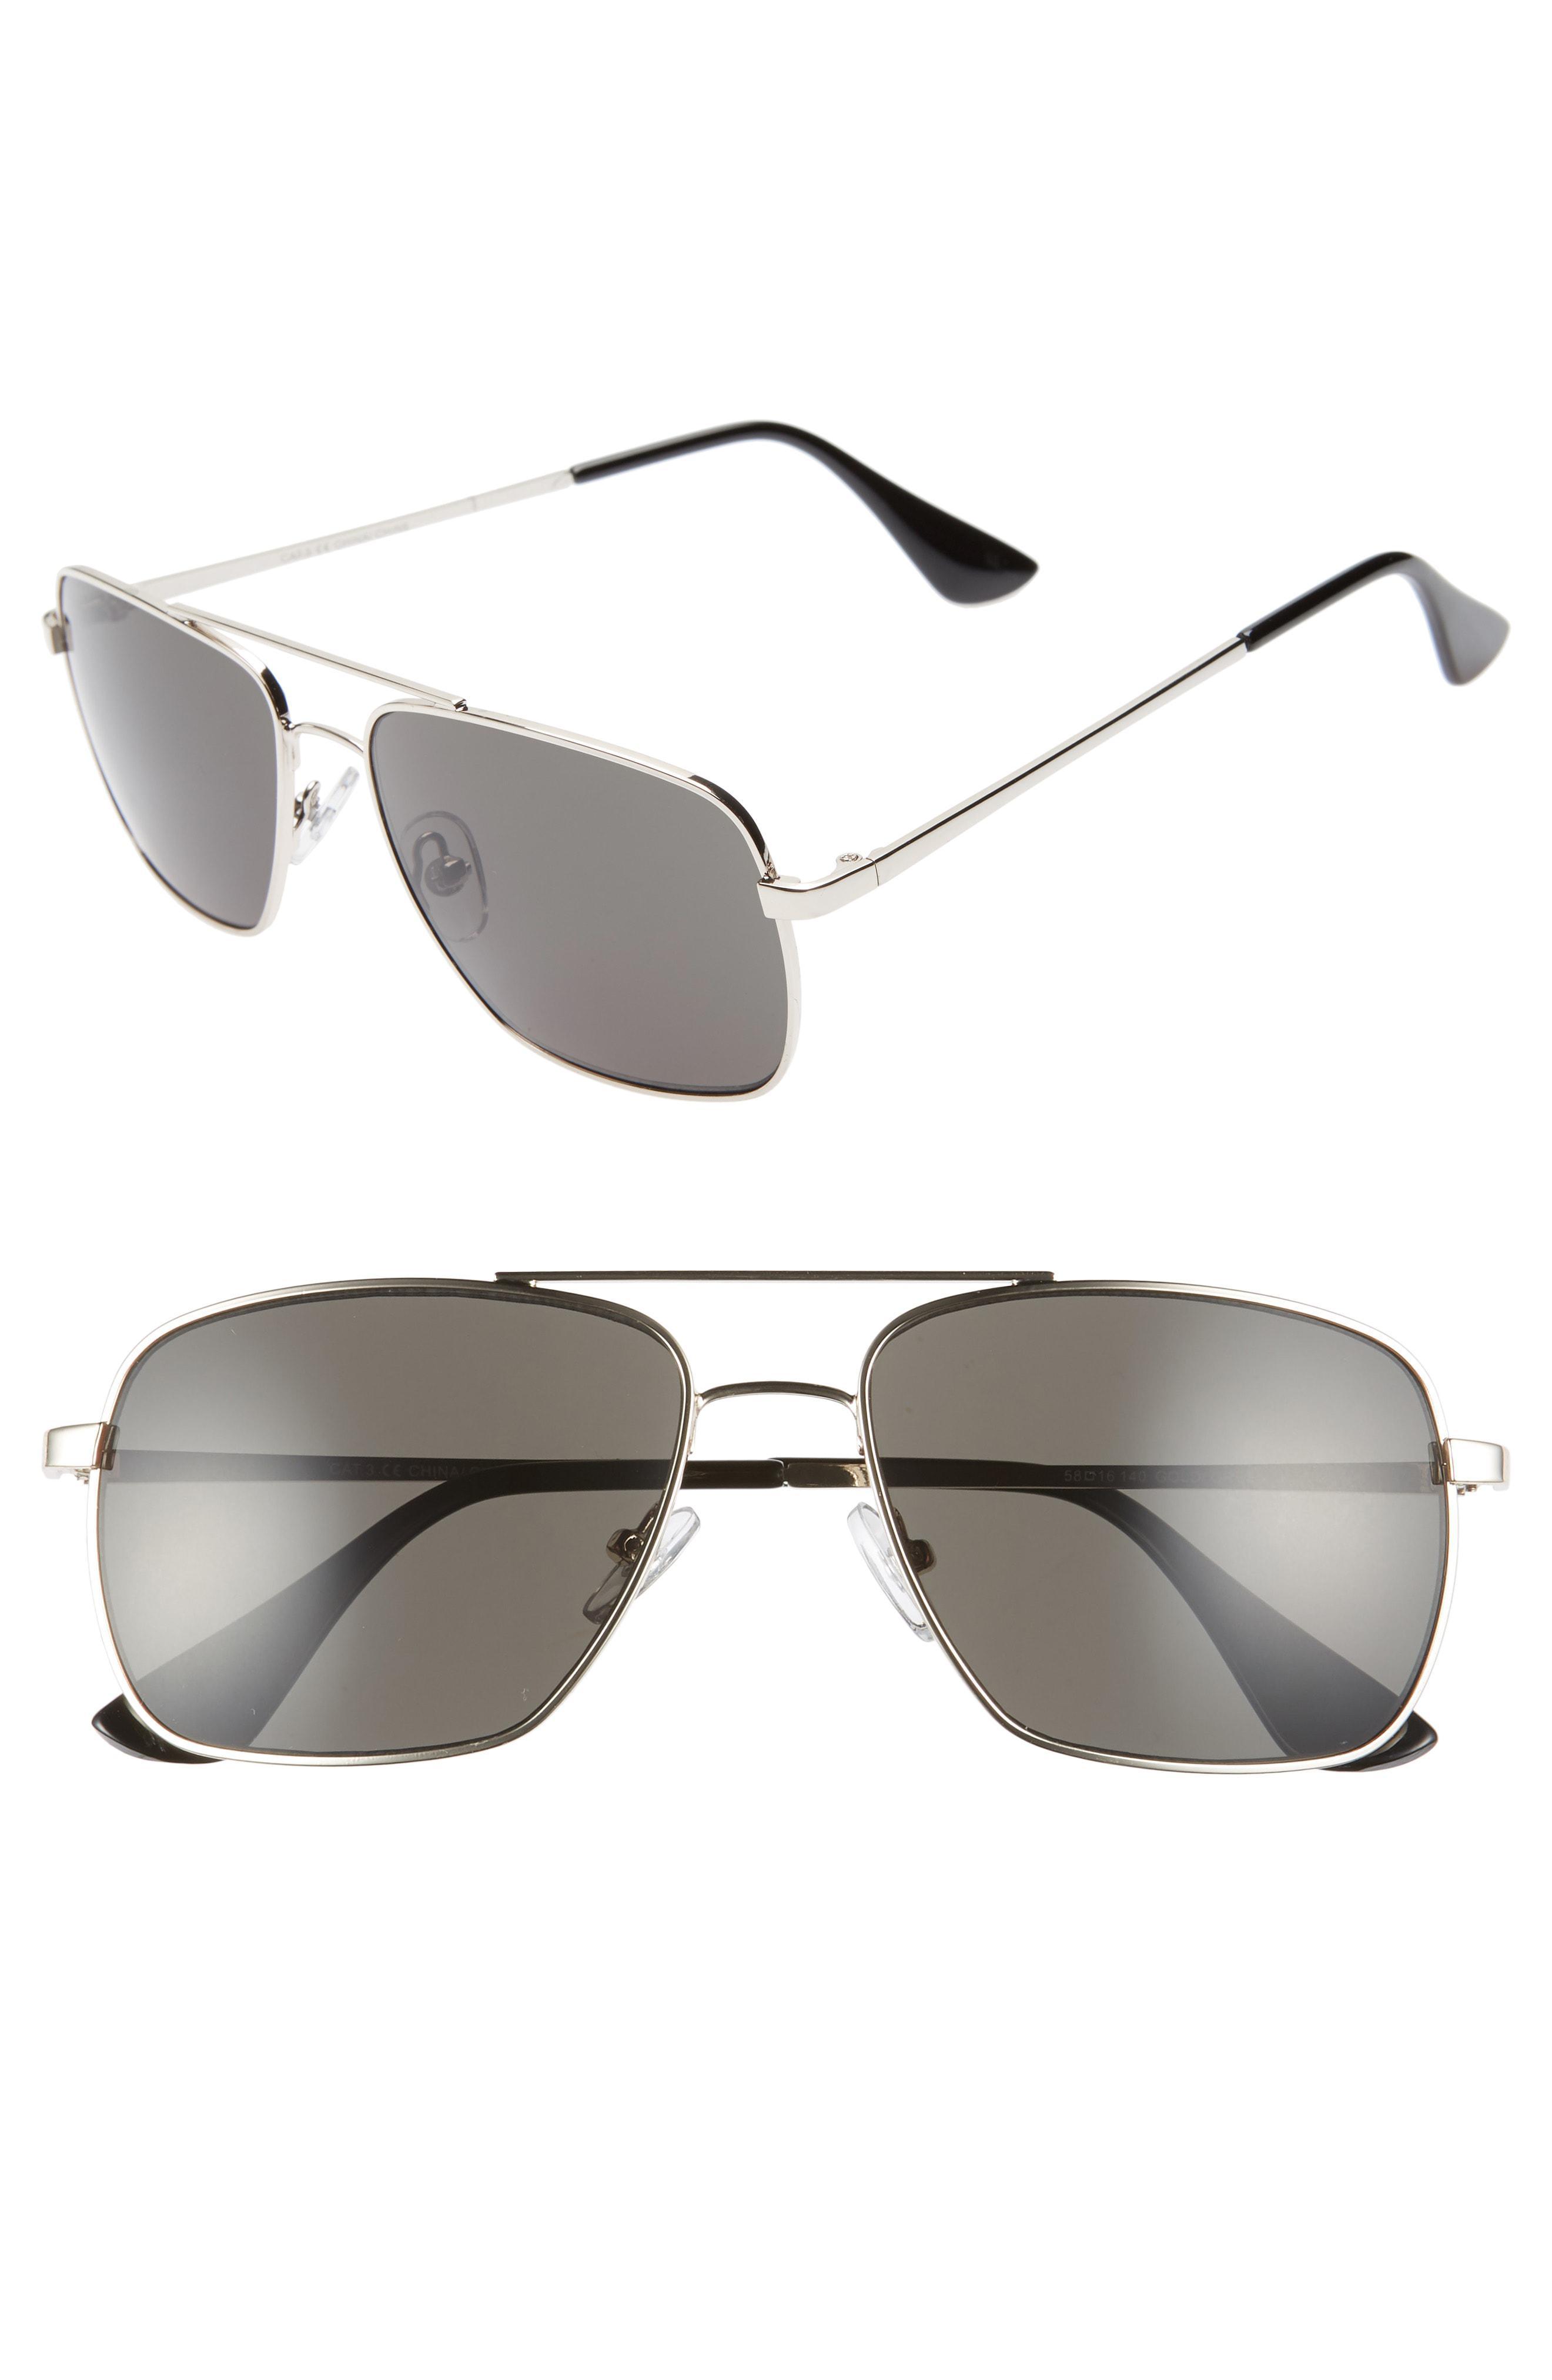 5268c22d71c Lyst - Nordstrom 1901 Taylor 58mm Aviator Sunglasses - in Metallic ...